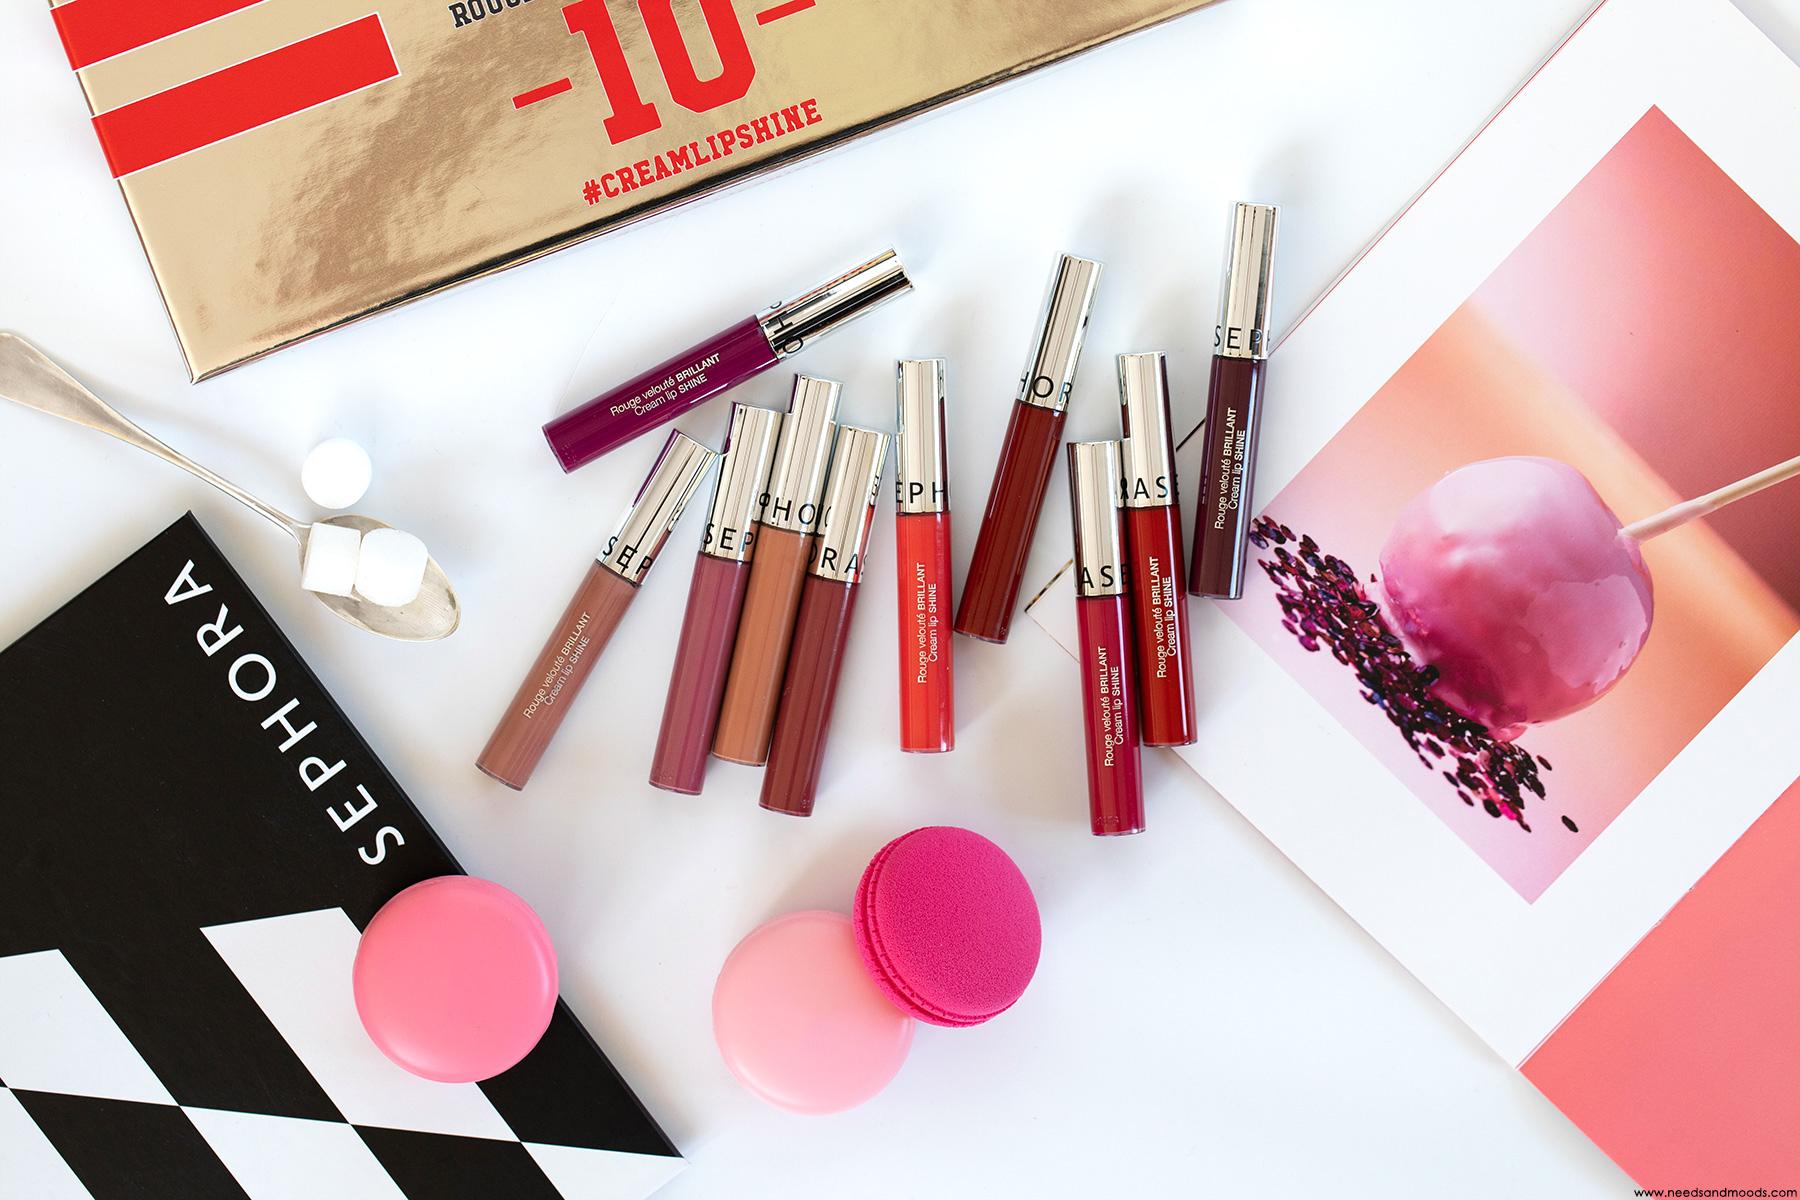 Sephora Cream Lip Shine Mon Avis Swatch De Toutes Les